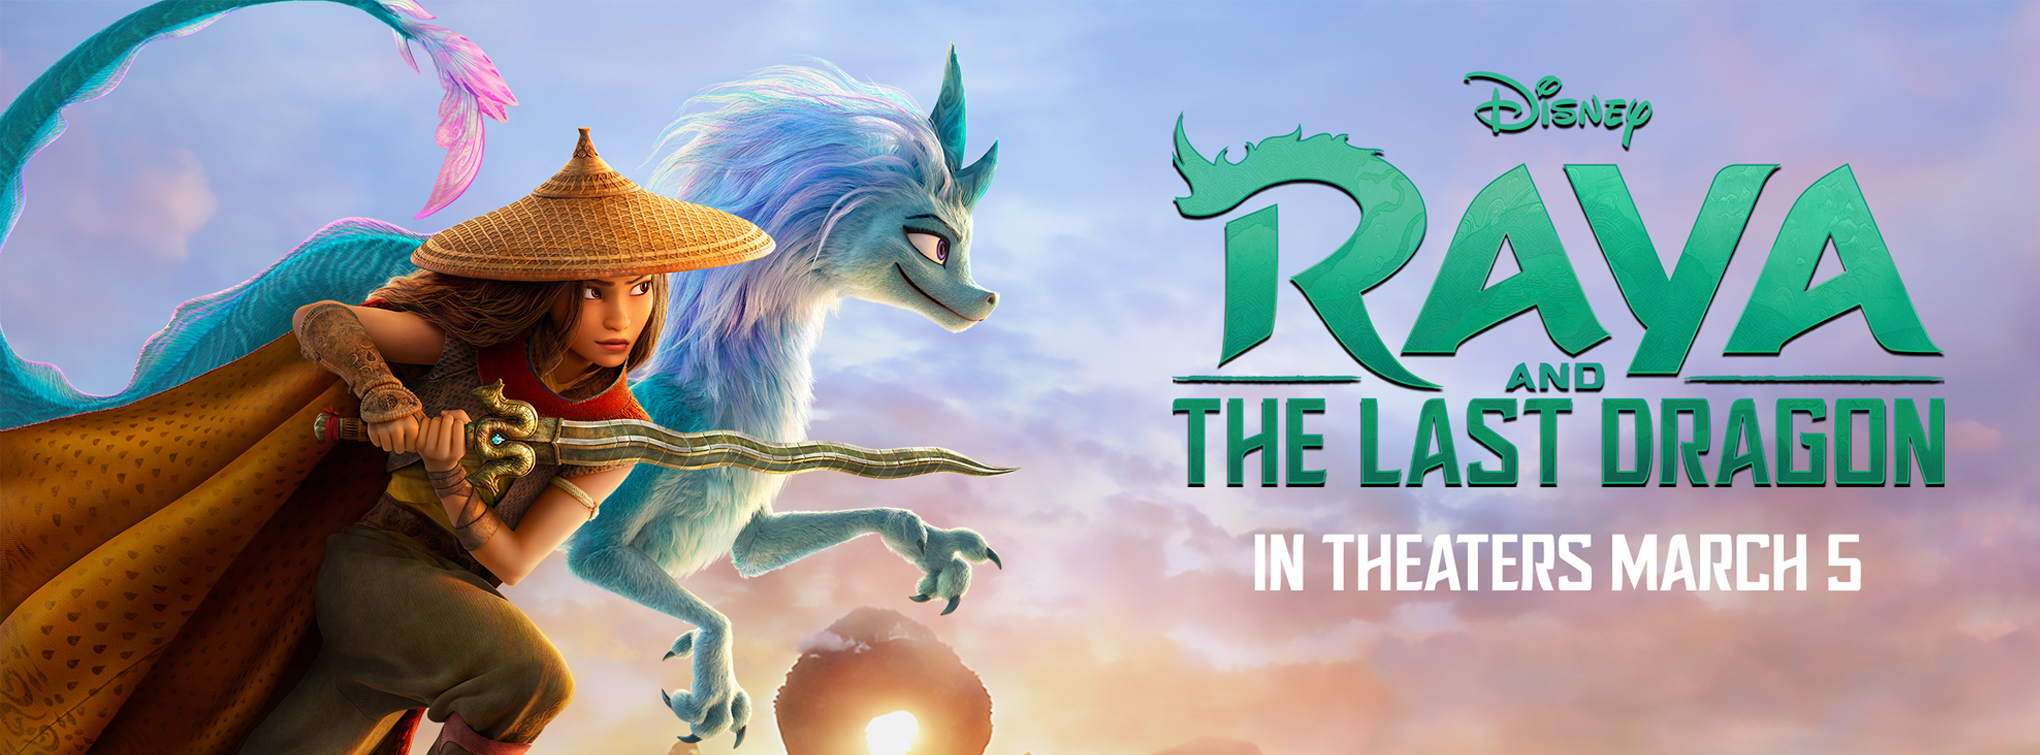 Slider image for Raya and the Last Dragon